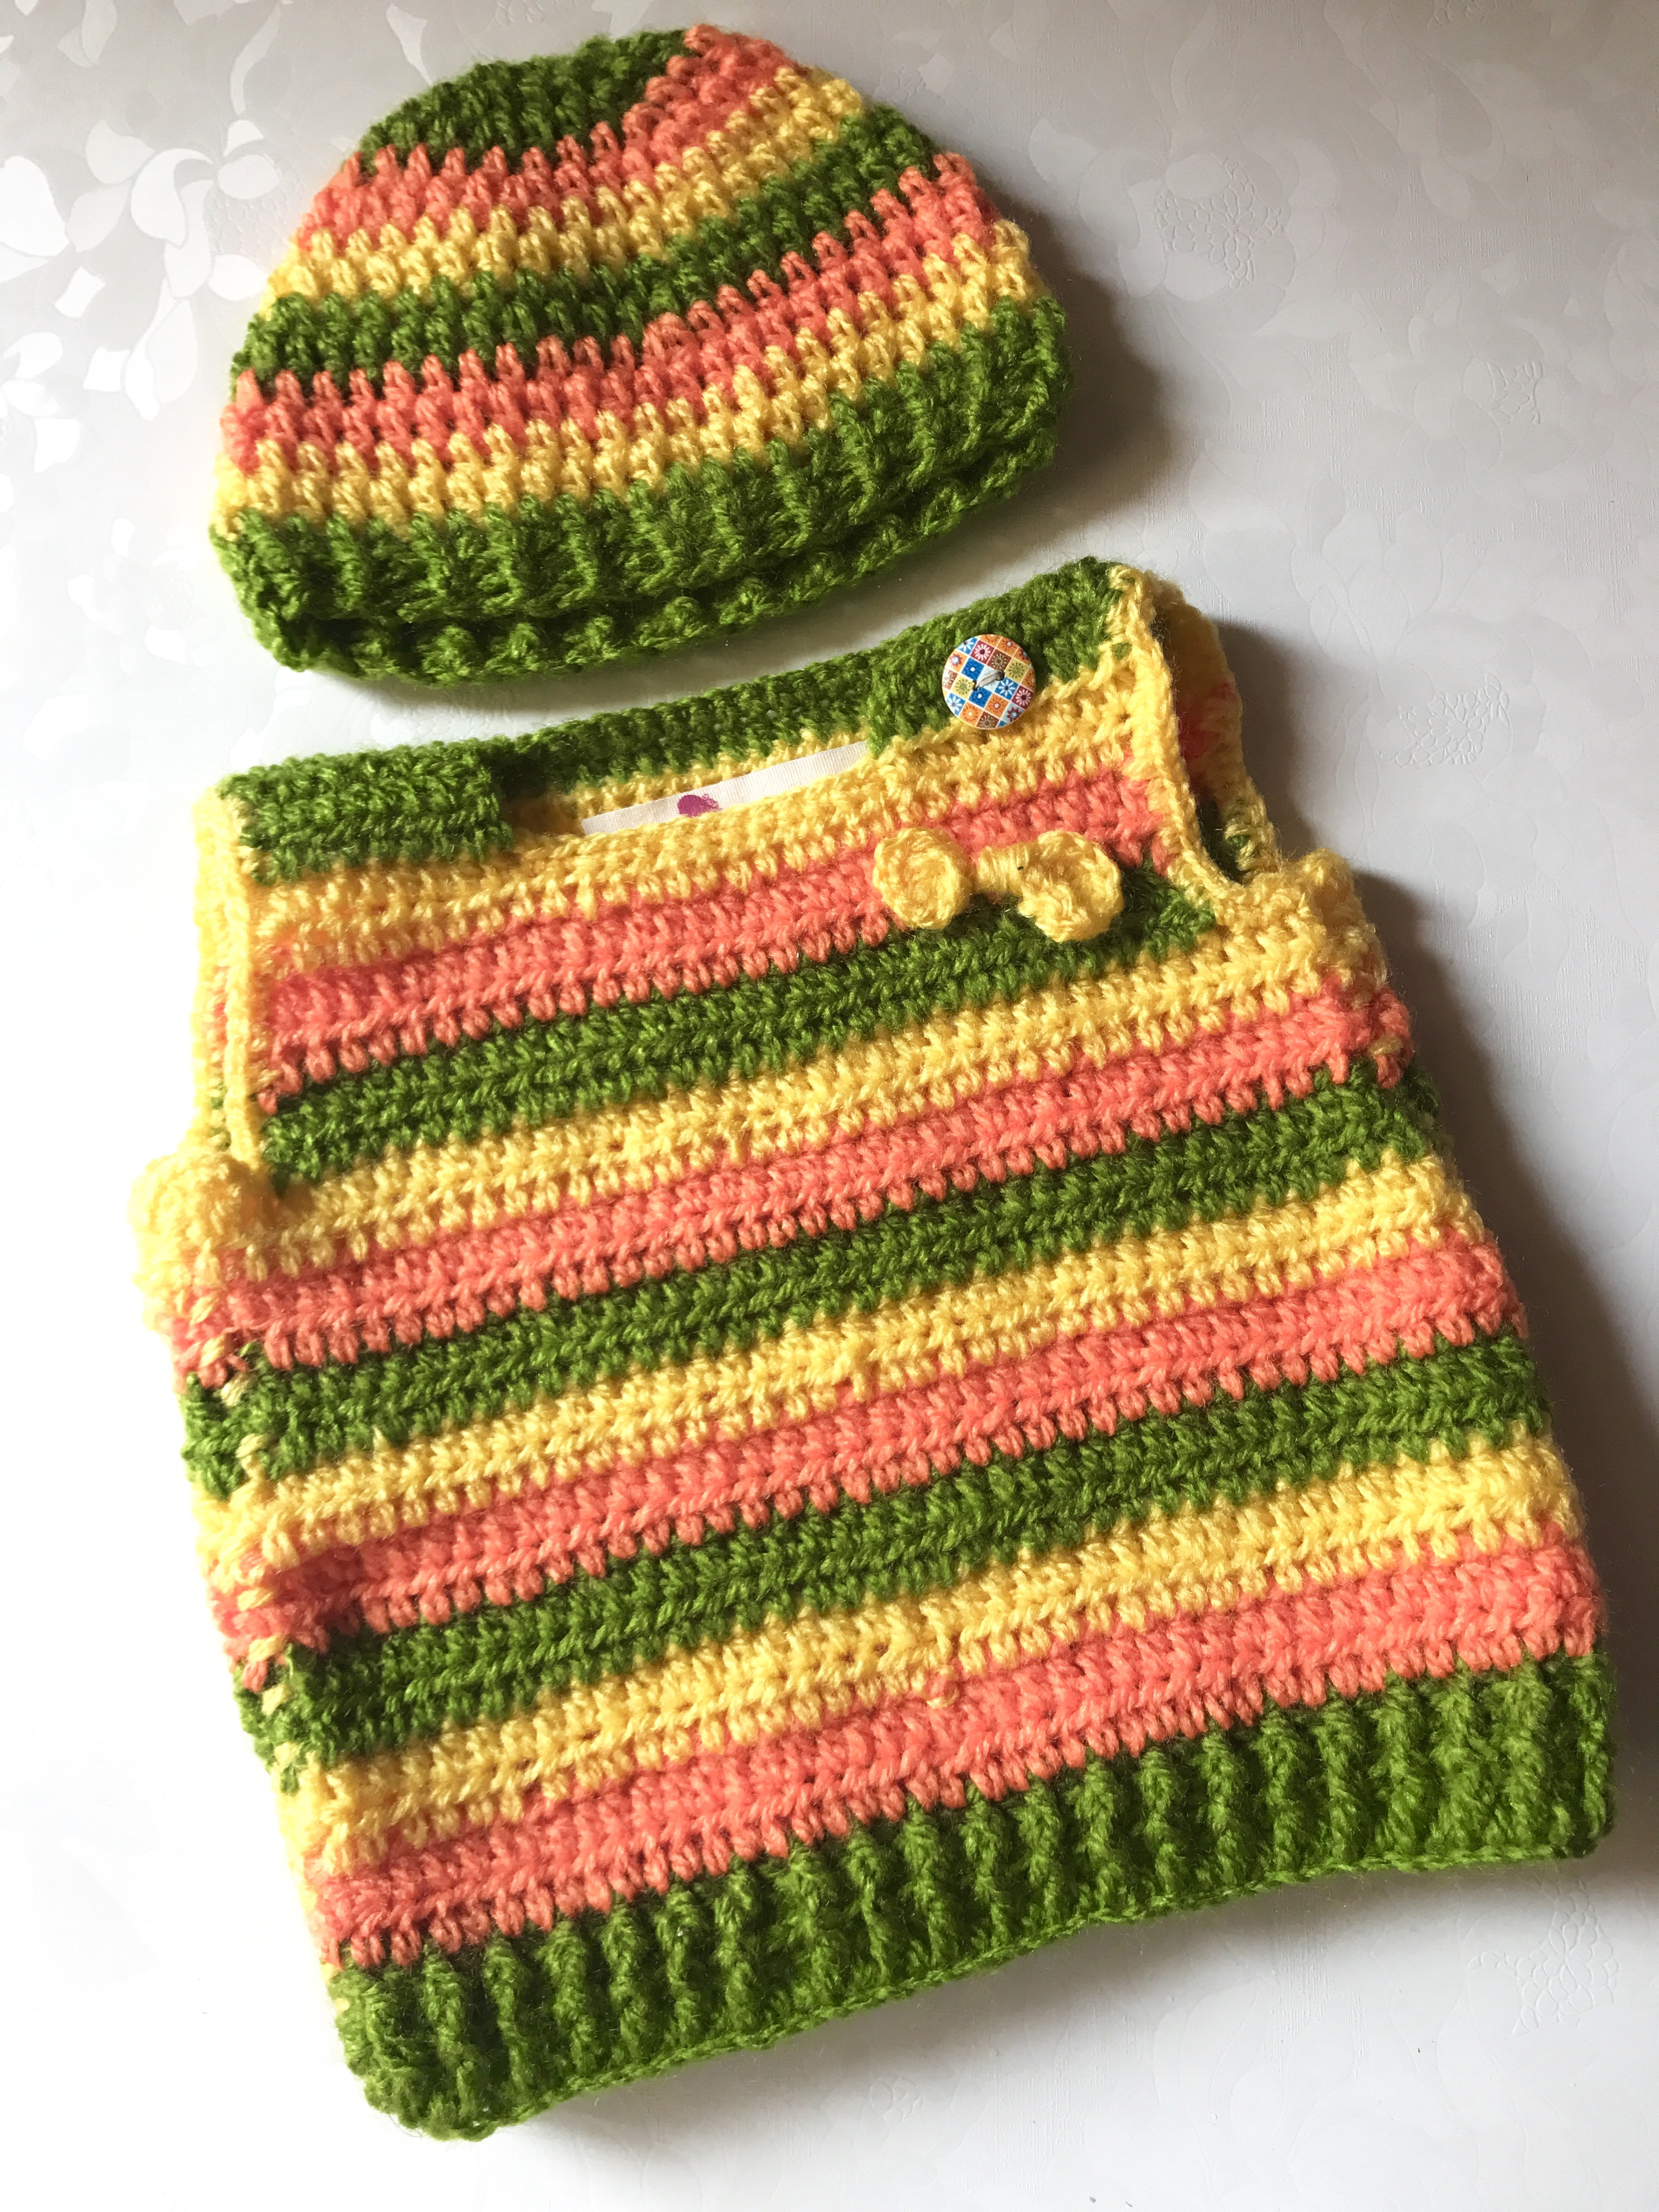 93eddeb53 Baby Half Sweater and Cap Set - The Crochet Bella